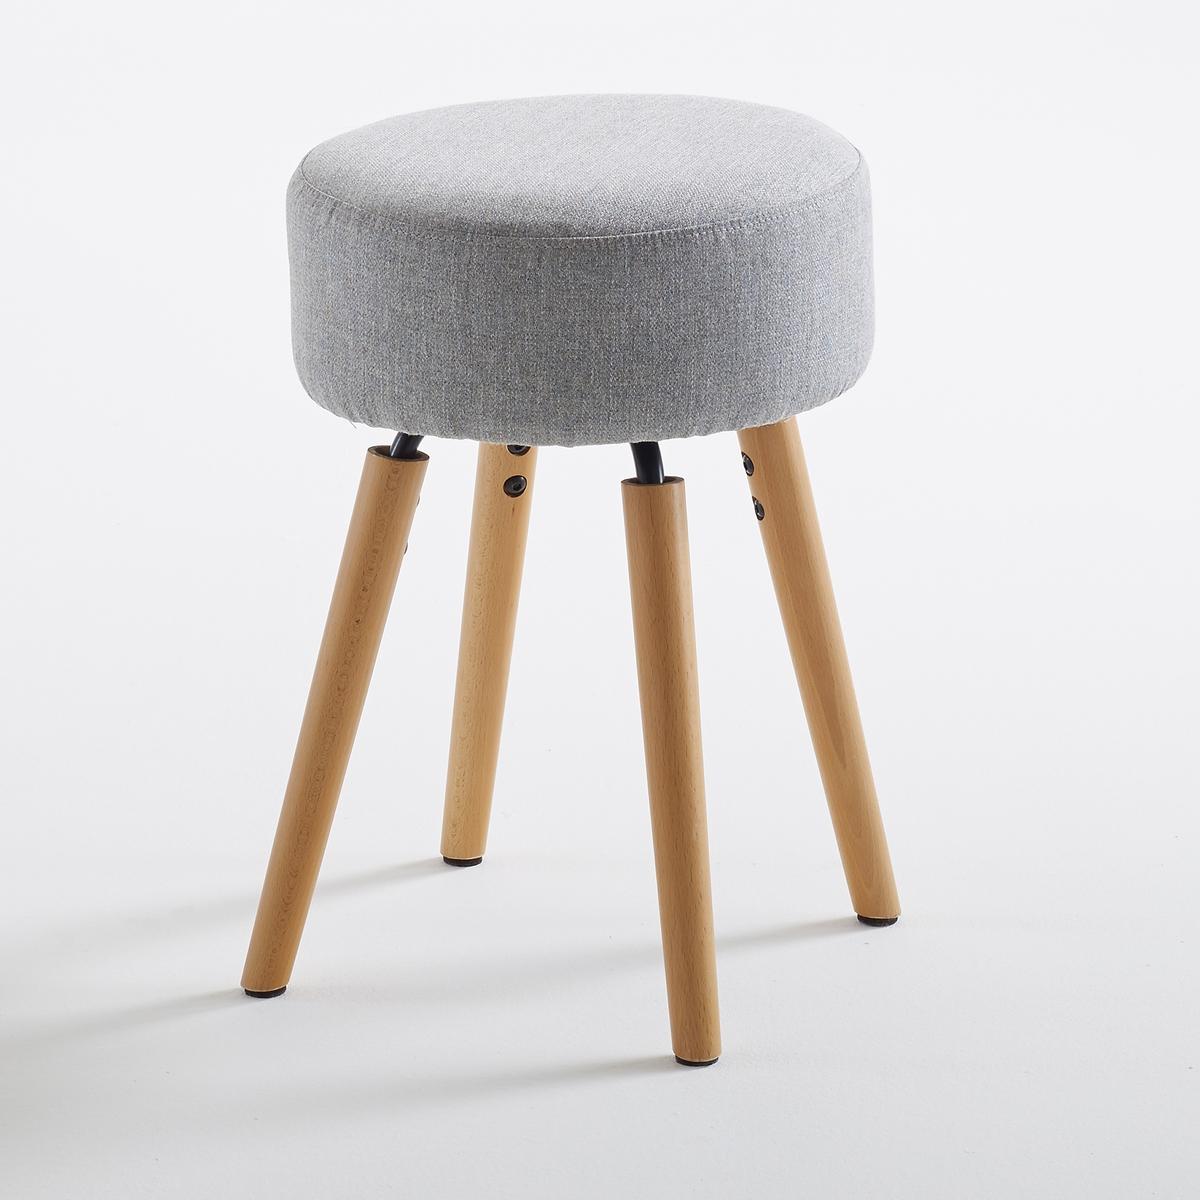 Табурет La Redoute Дизайнерский Asting единый размер серый